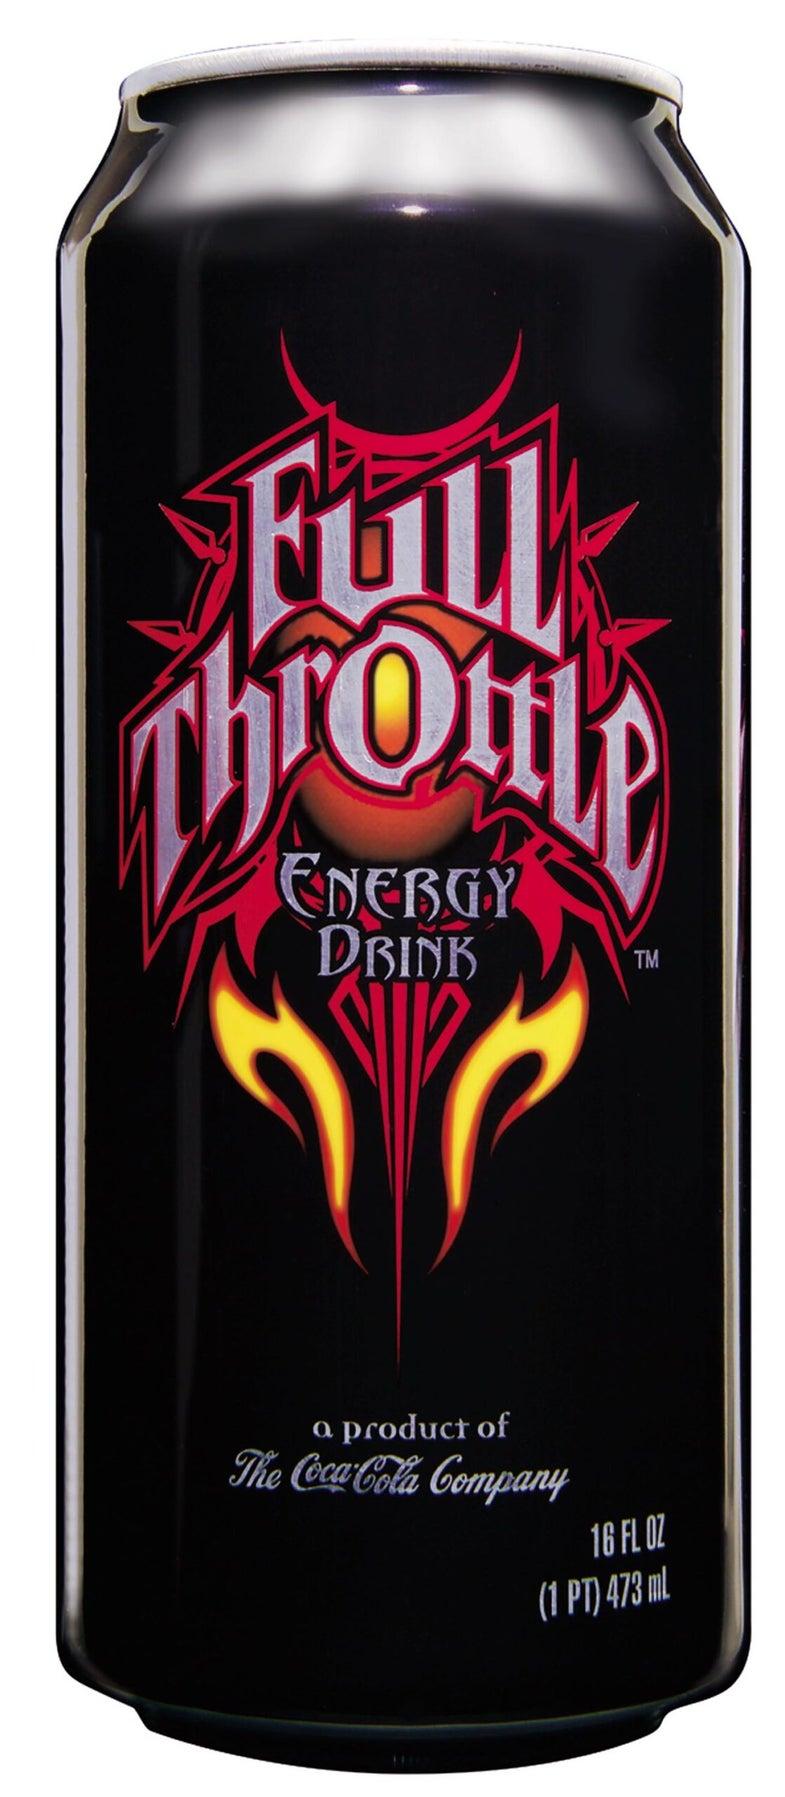 Energy Drinks May Promote Risky Behavior